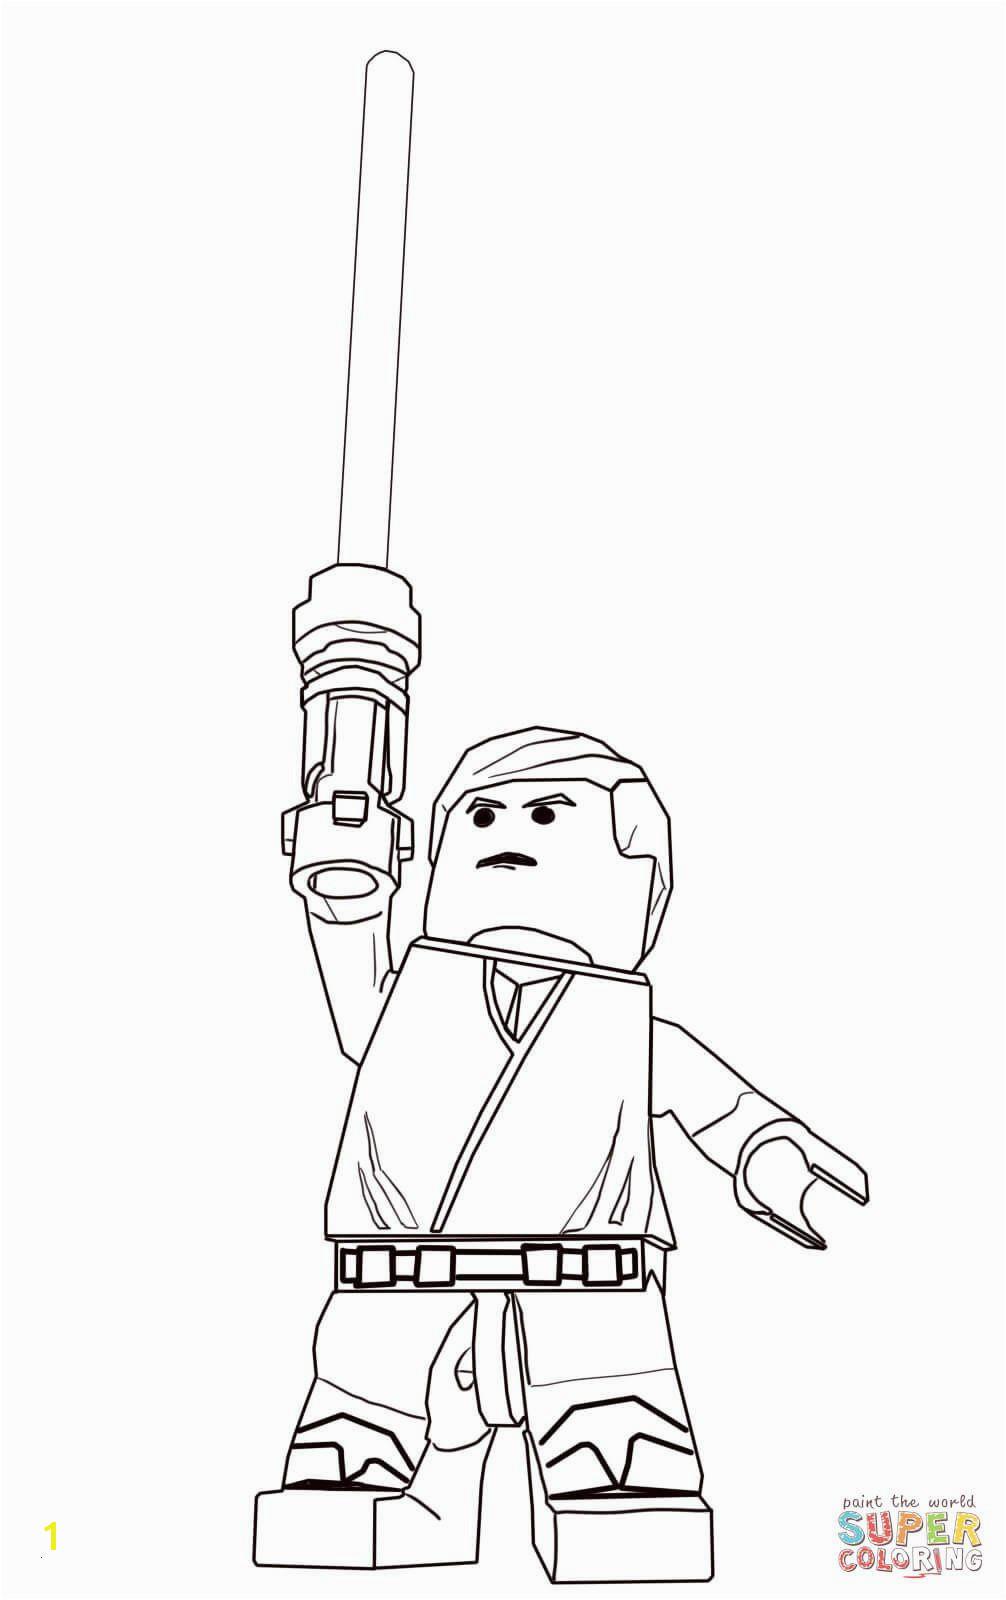 Lego Star Wars Luke Skywalker Coloring Pages Ausmalbilder Clone Wars Frisch Star Wars Ausmalbilder Luke Skywalker